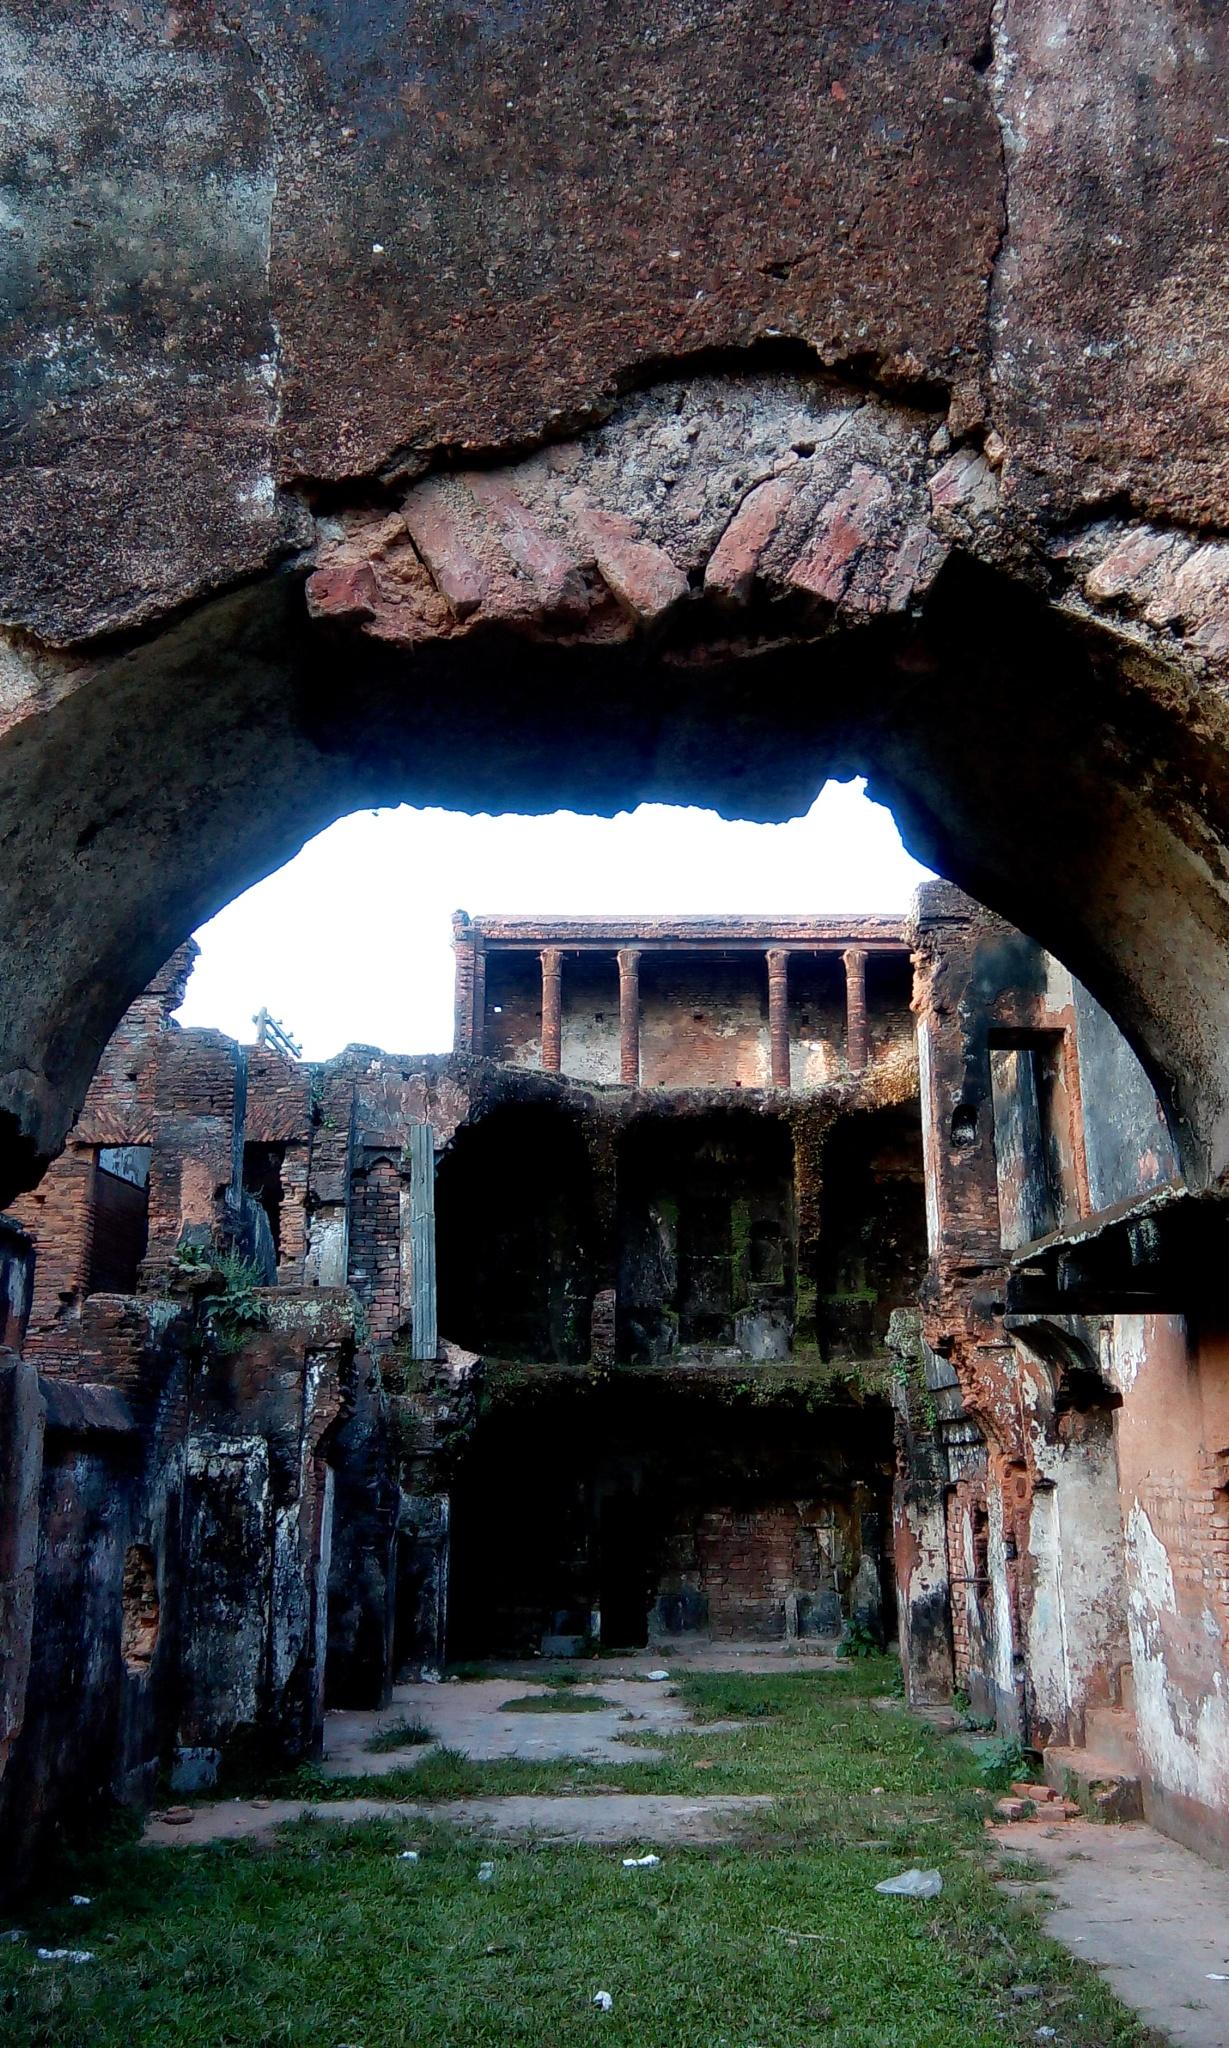 Panam the lost city by John Quazi